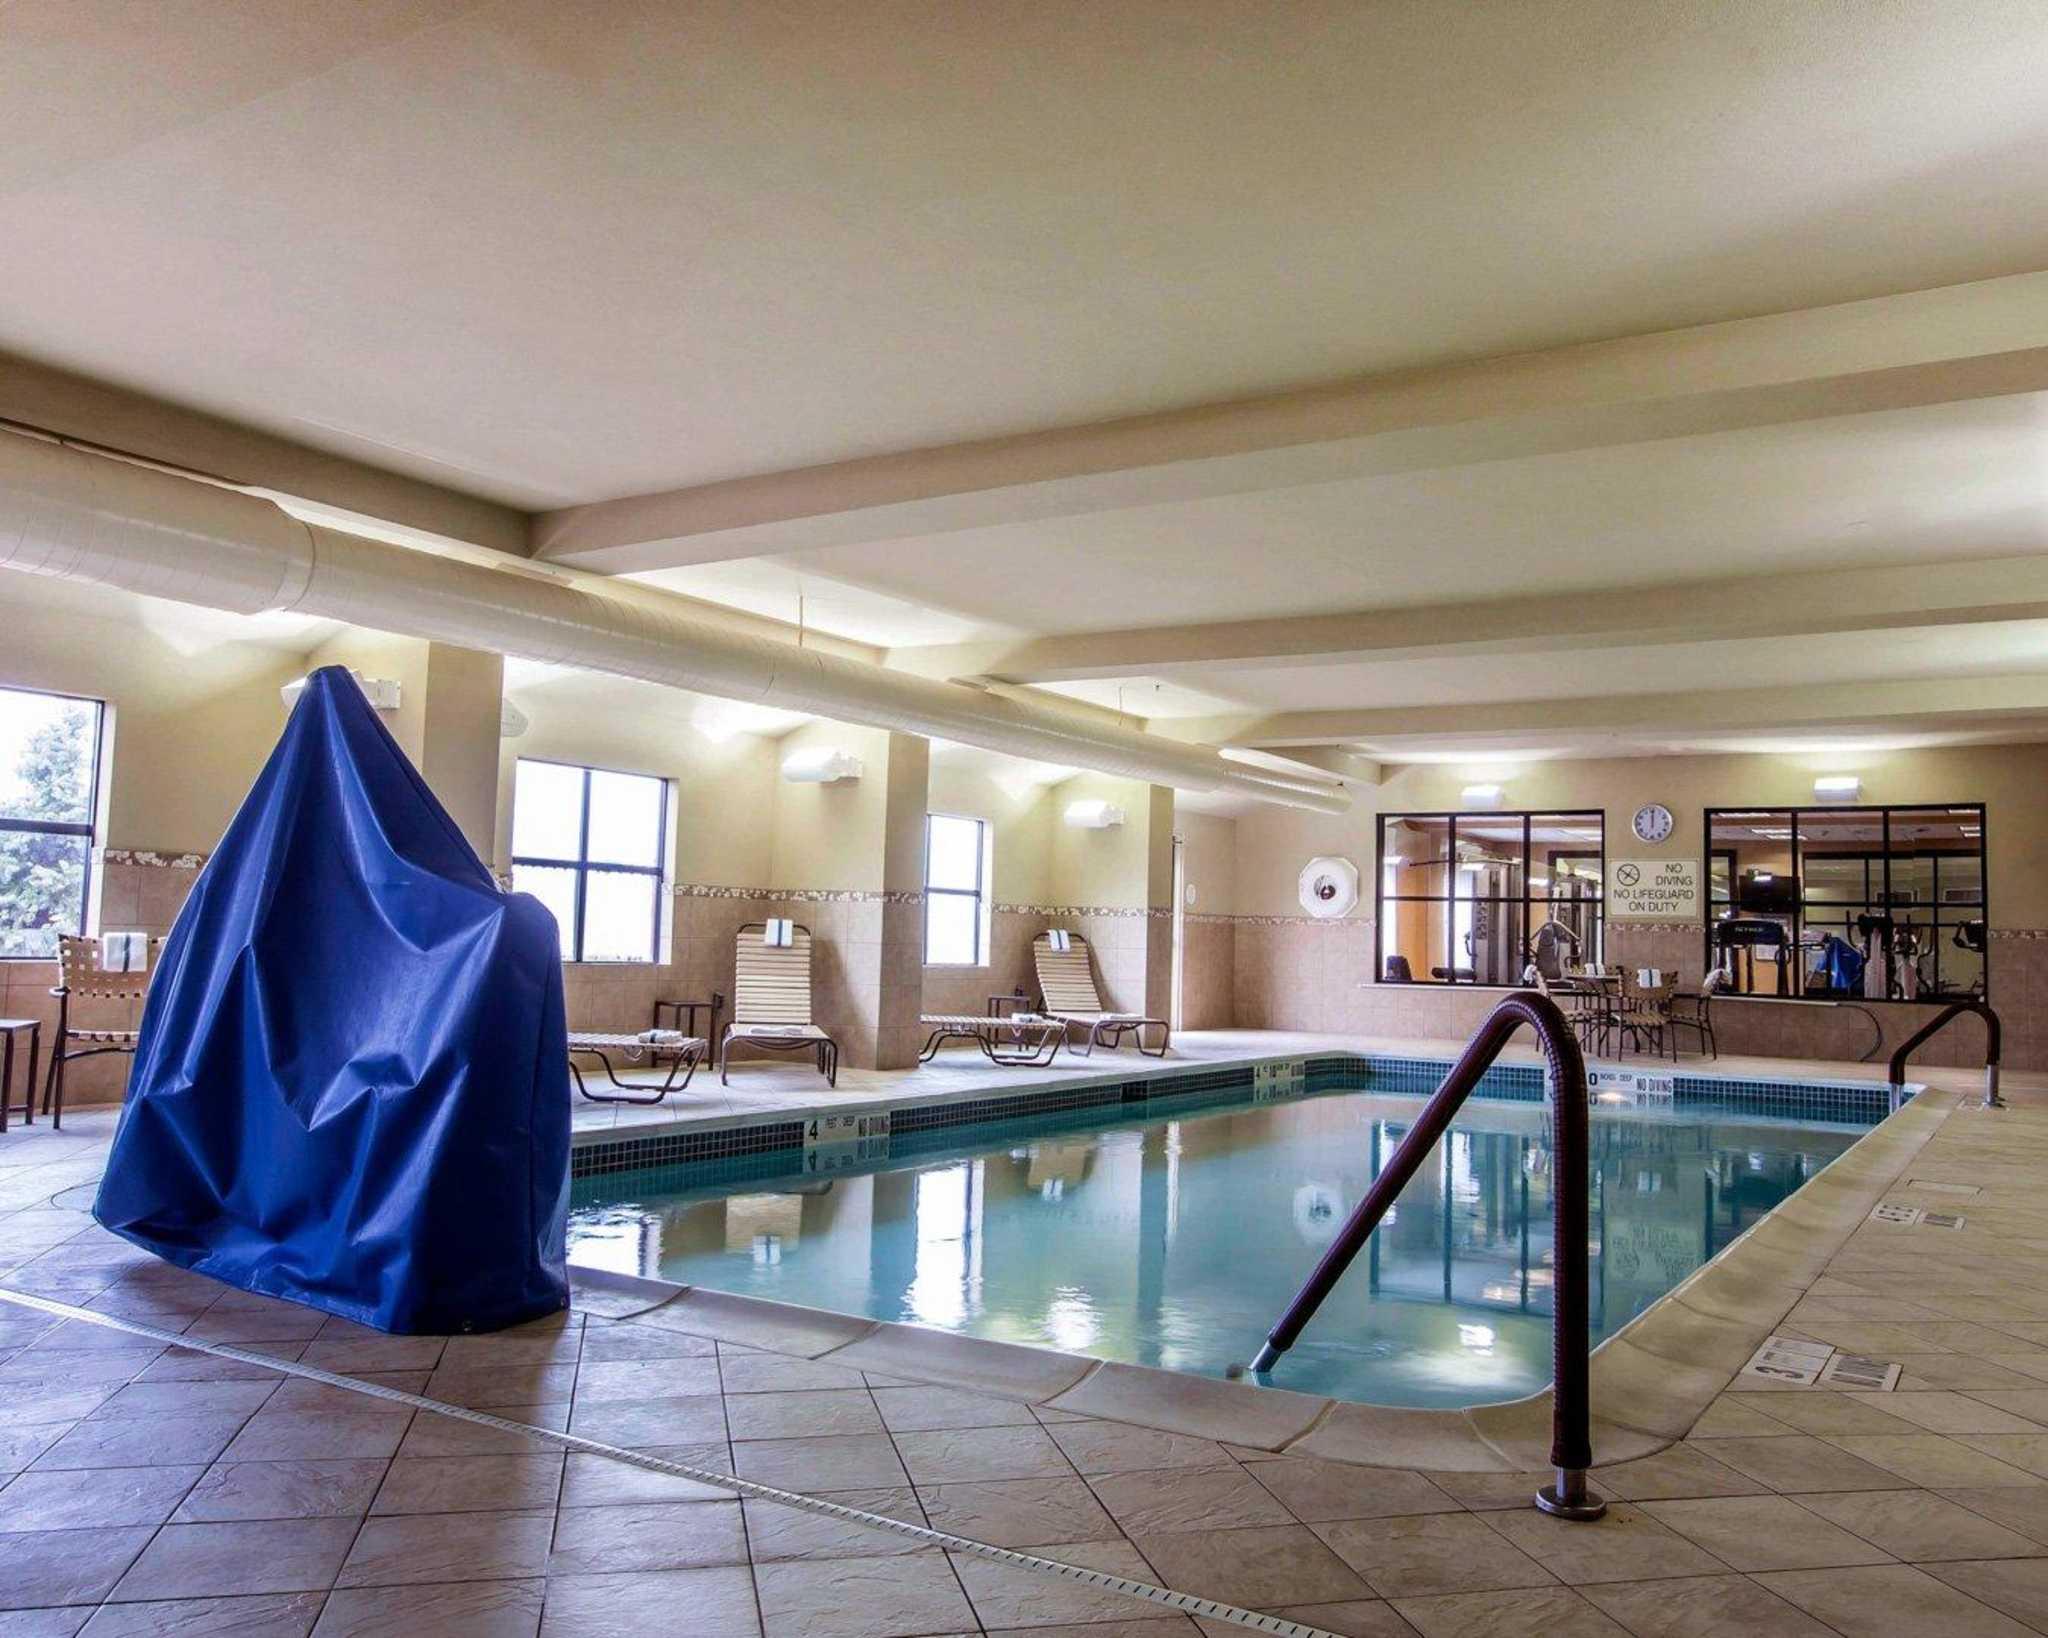 Comfort Inn & Suites adj to Akwesasne Mohawk Casino image 27